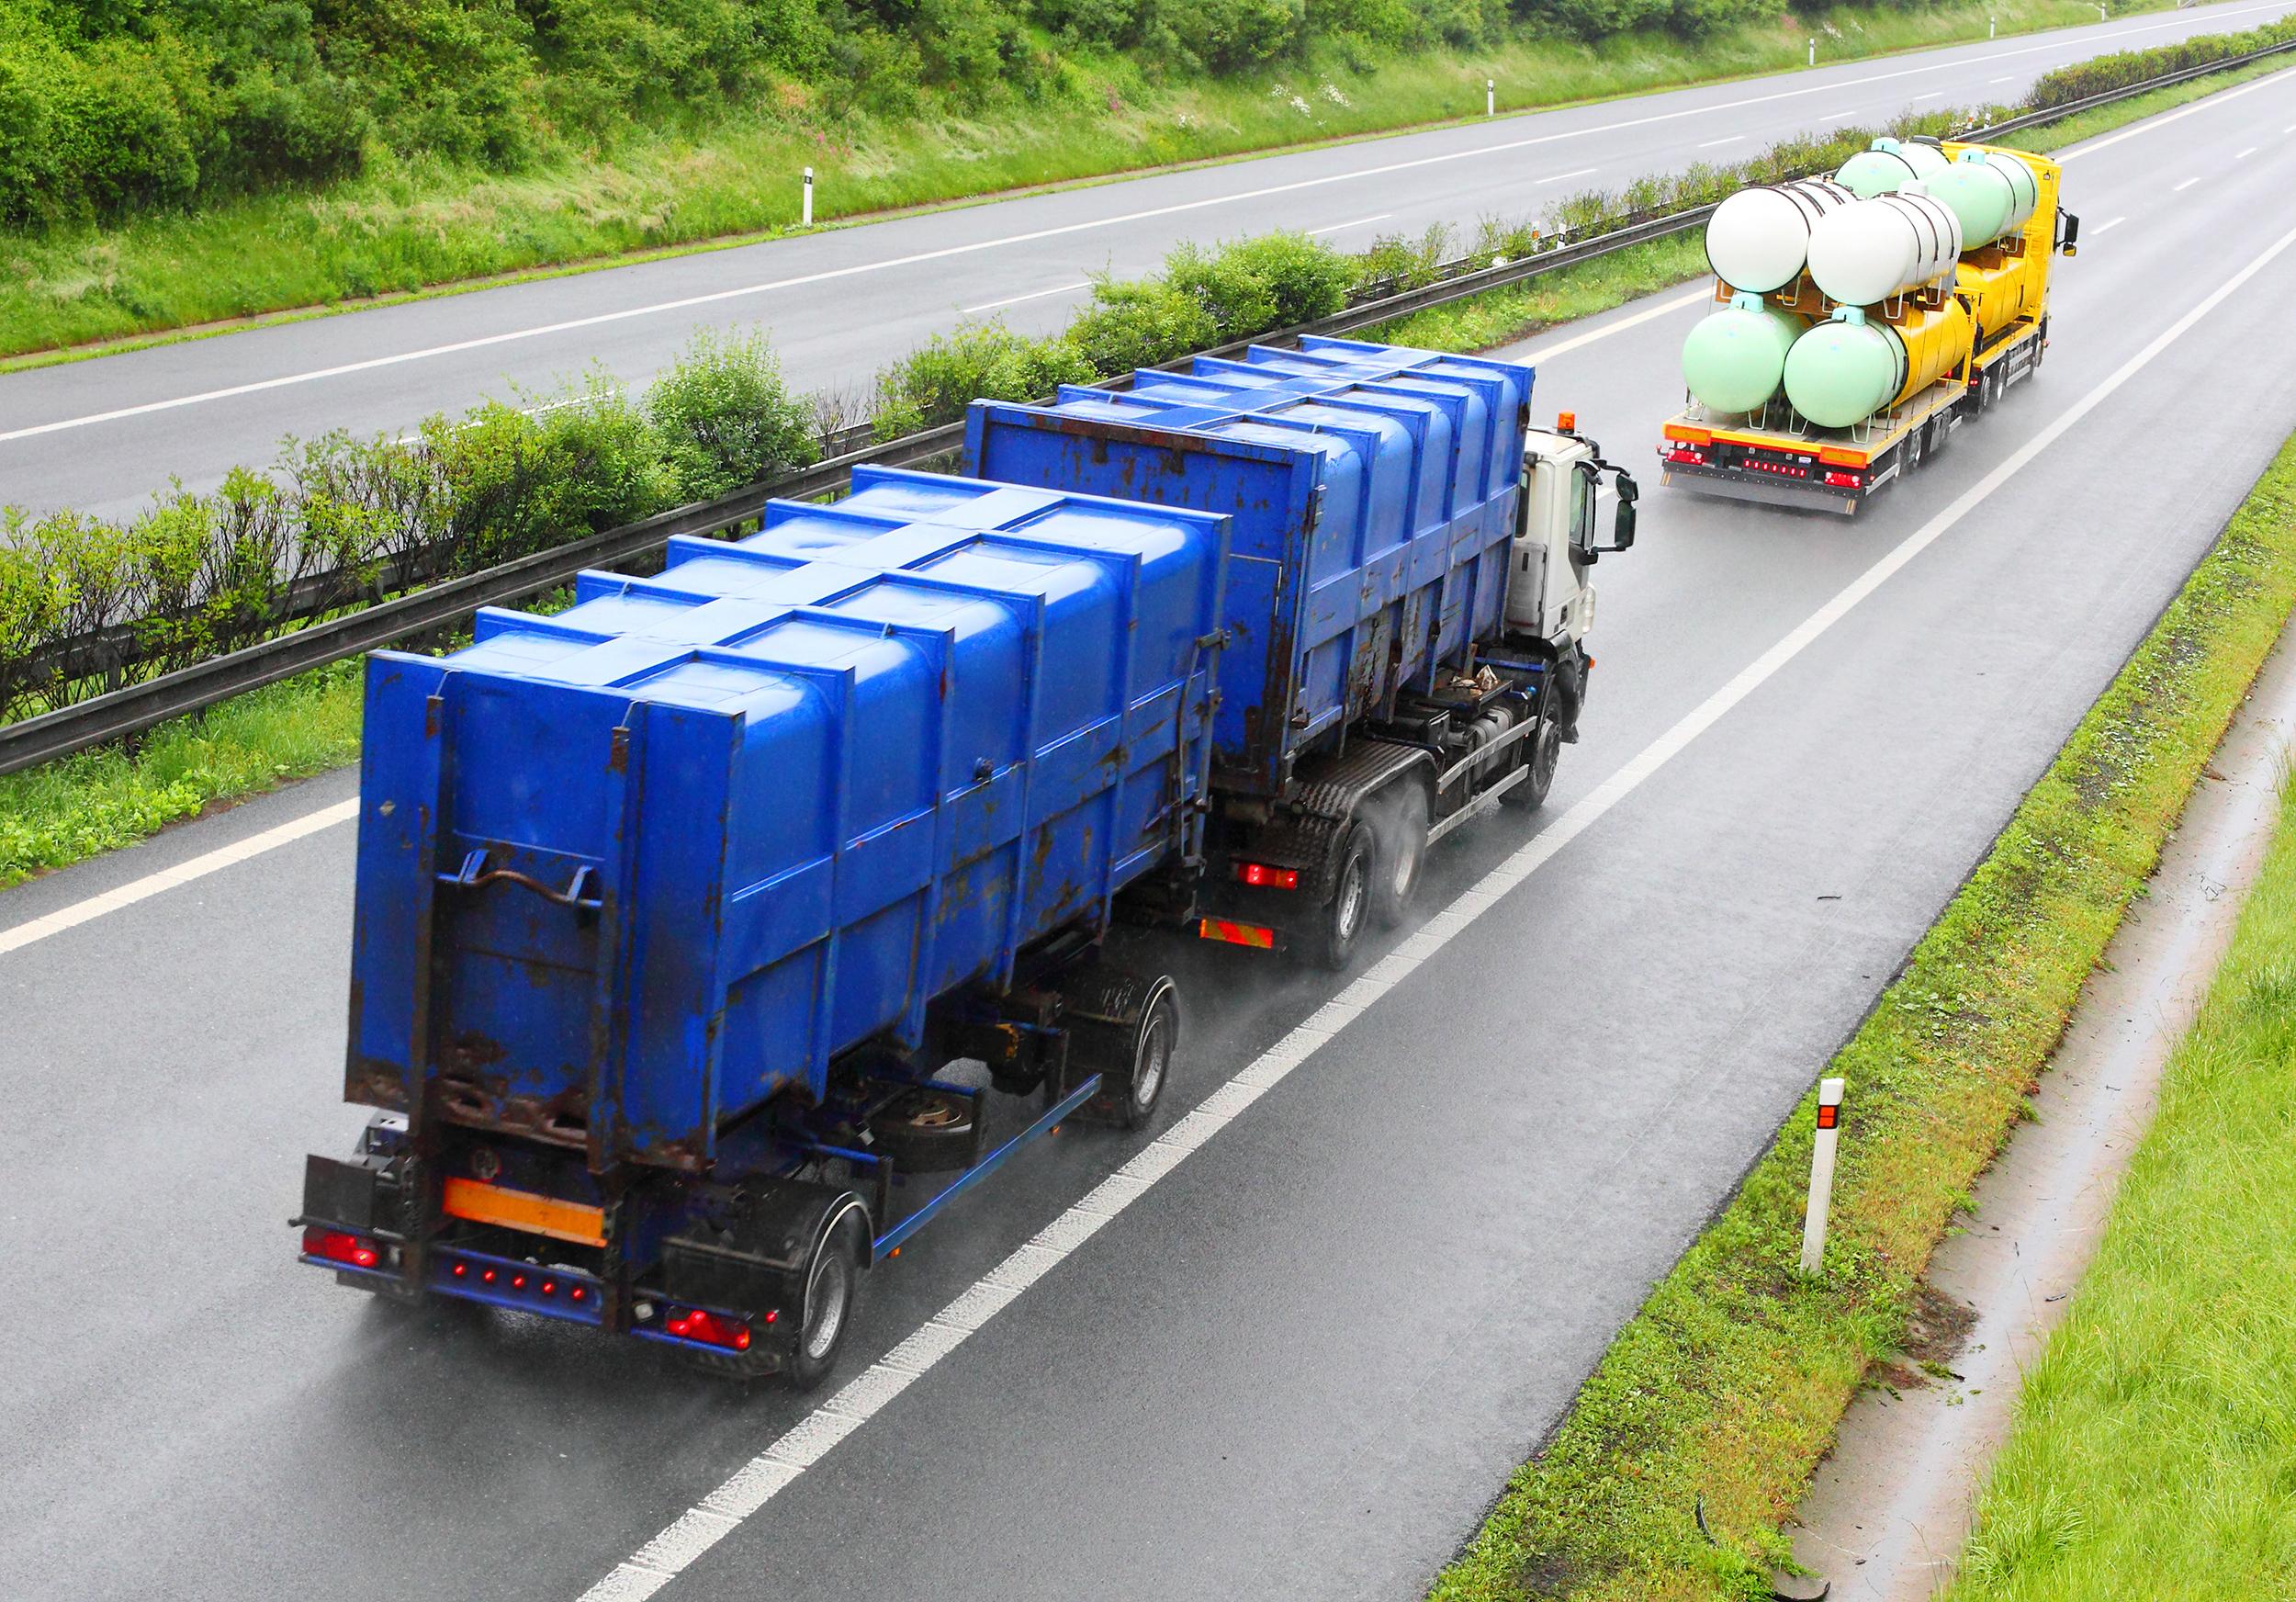 Toxic waste disposal trucks